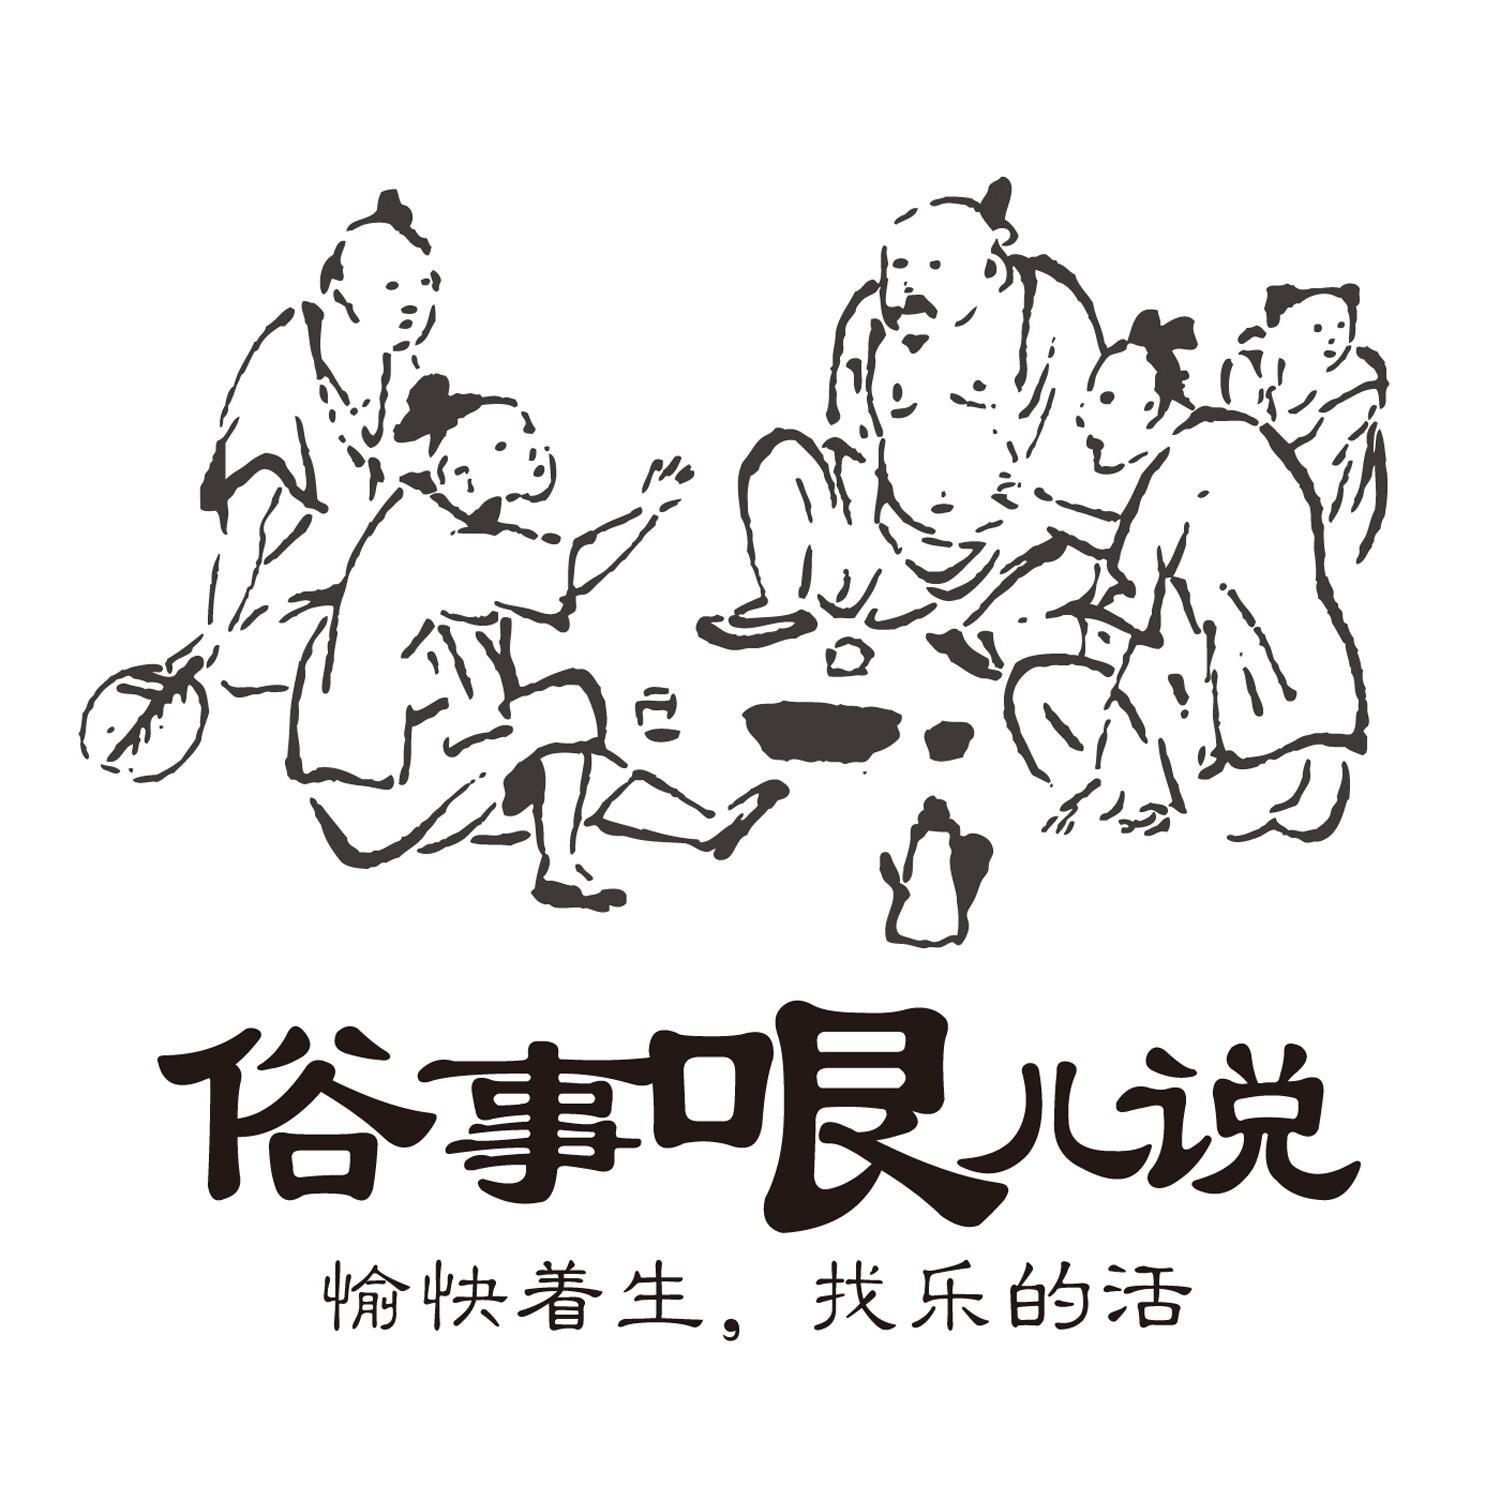 <![CDATA[俗事哏儿说]]>